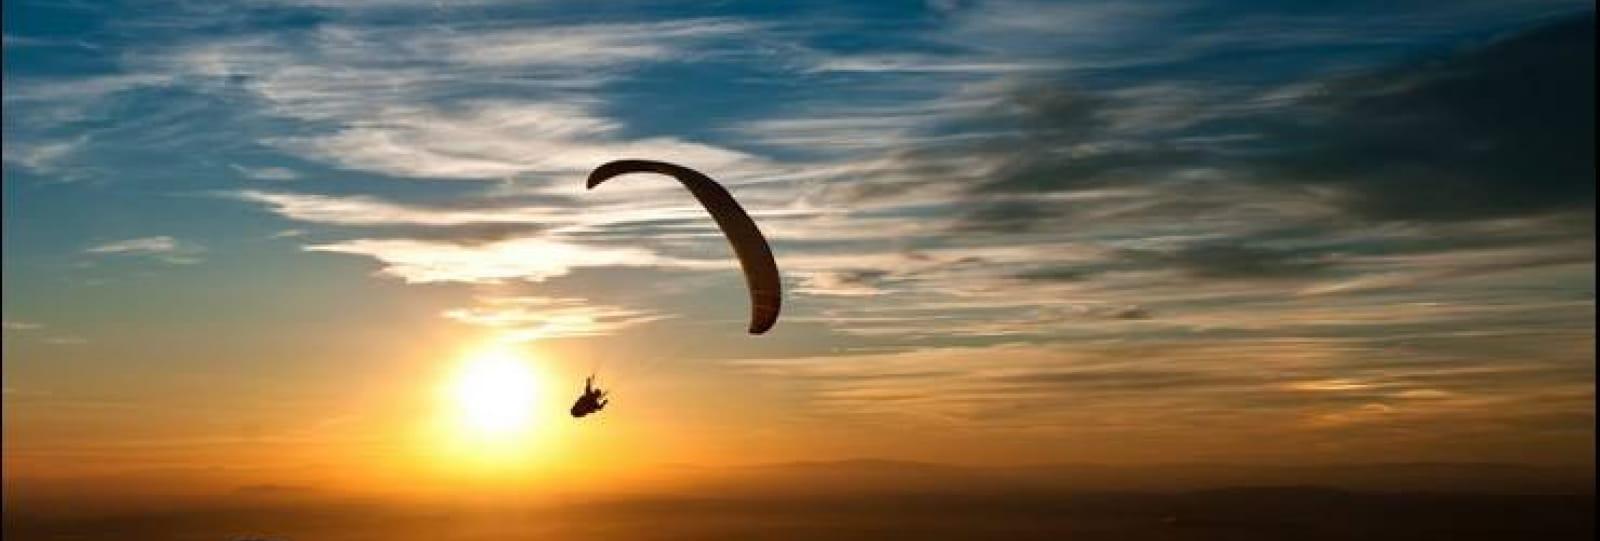 Baronnies- Paragliding - « Lou Ventoun »